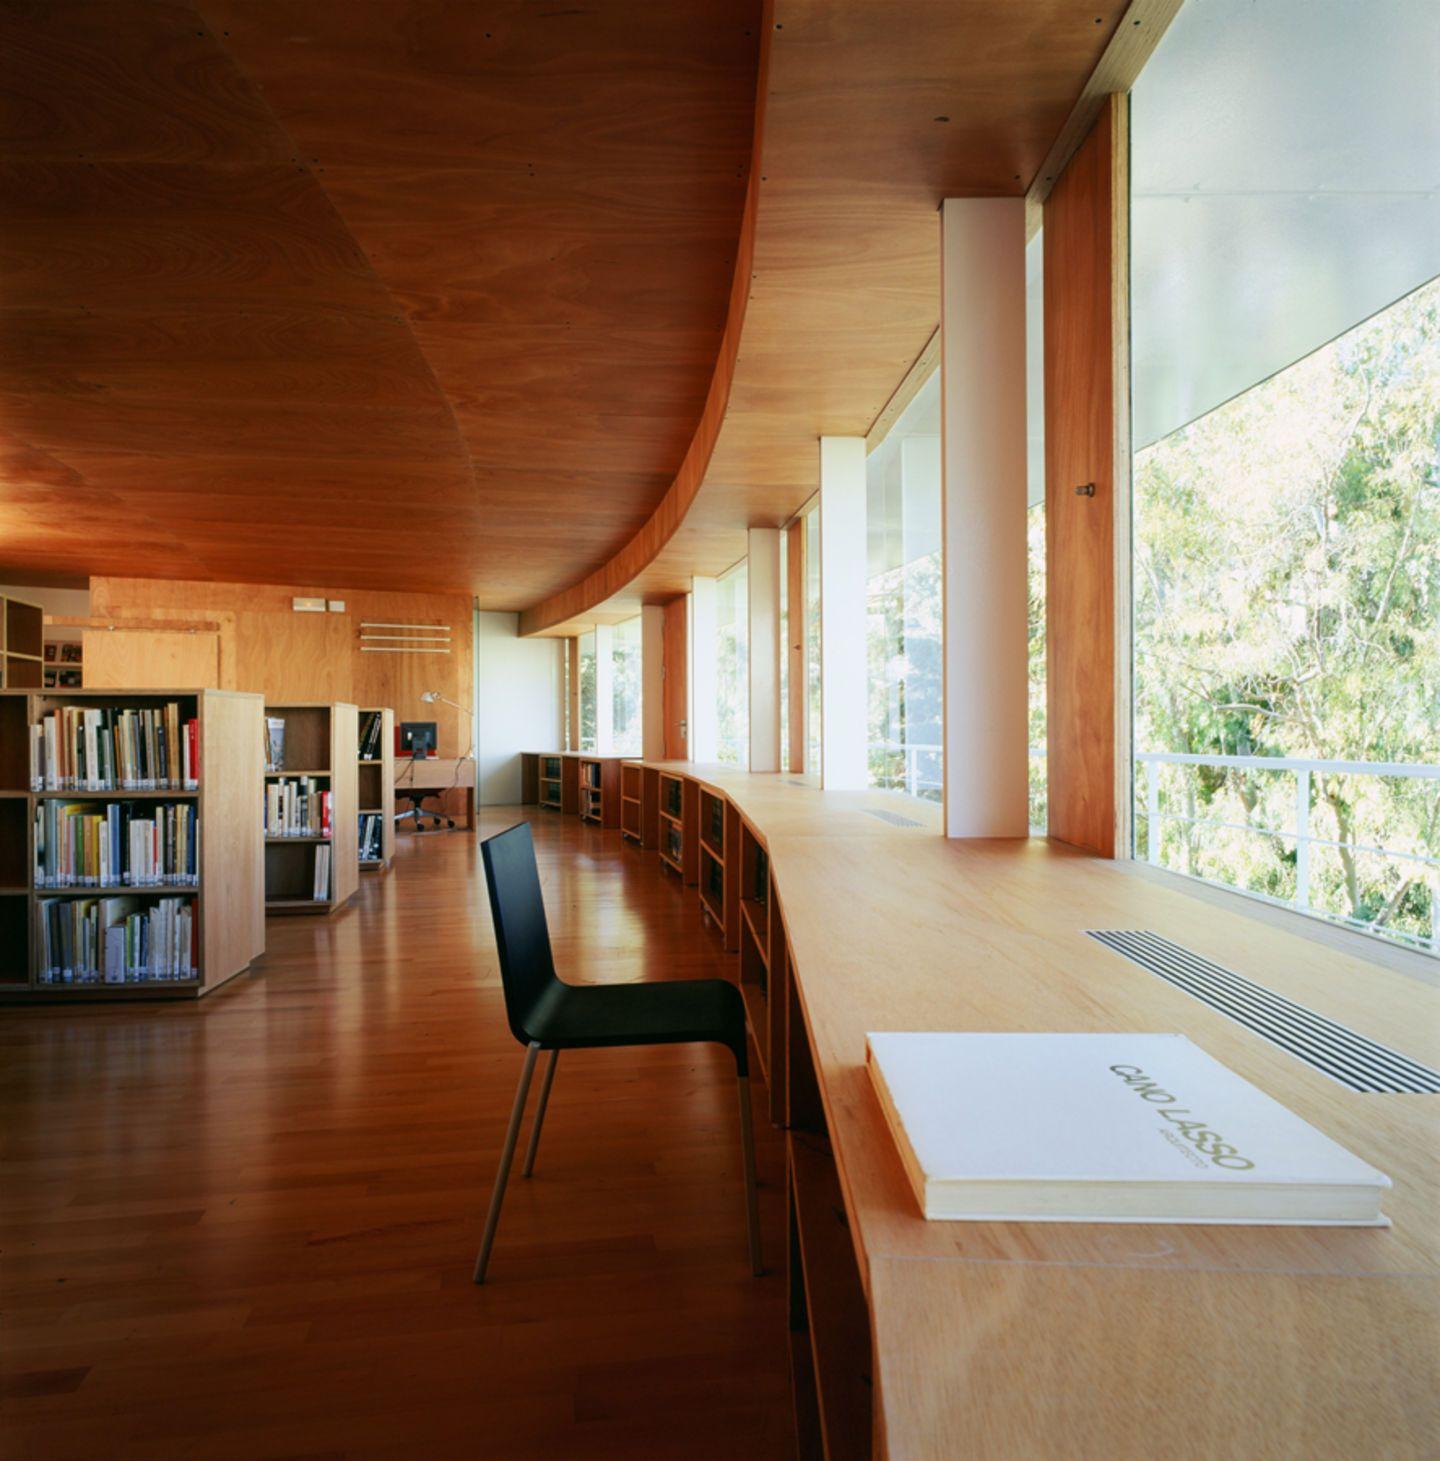 edificio ampliación cano lasso colegio arquitectos malaga - Buscar con Google